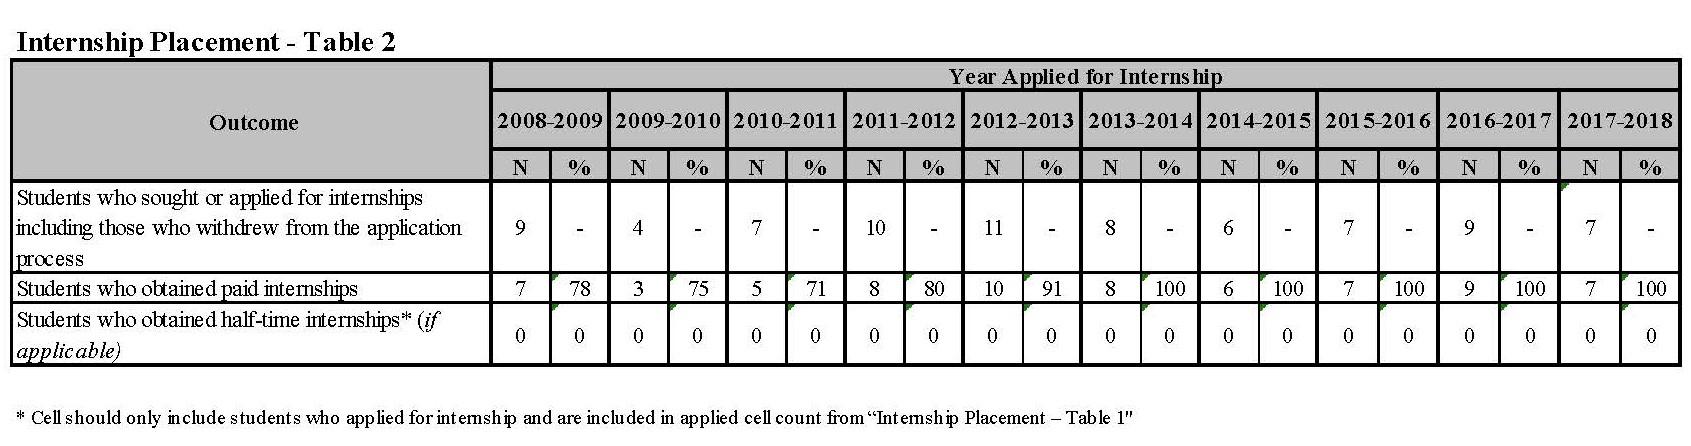 Internship Placement - Table 2 2017 - 2018